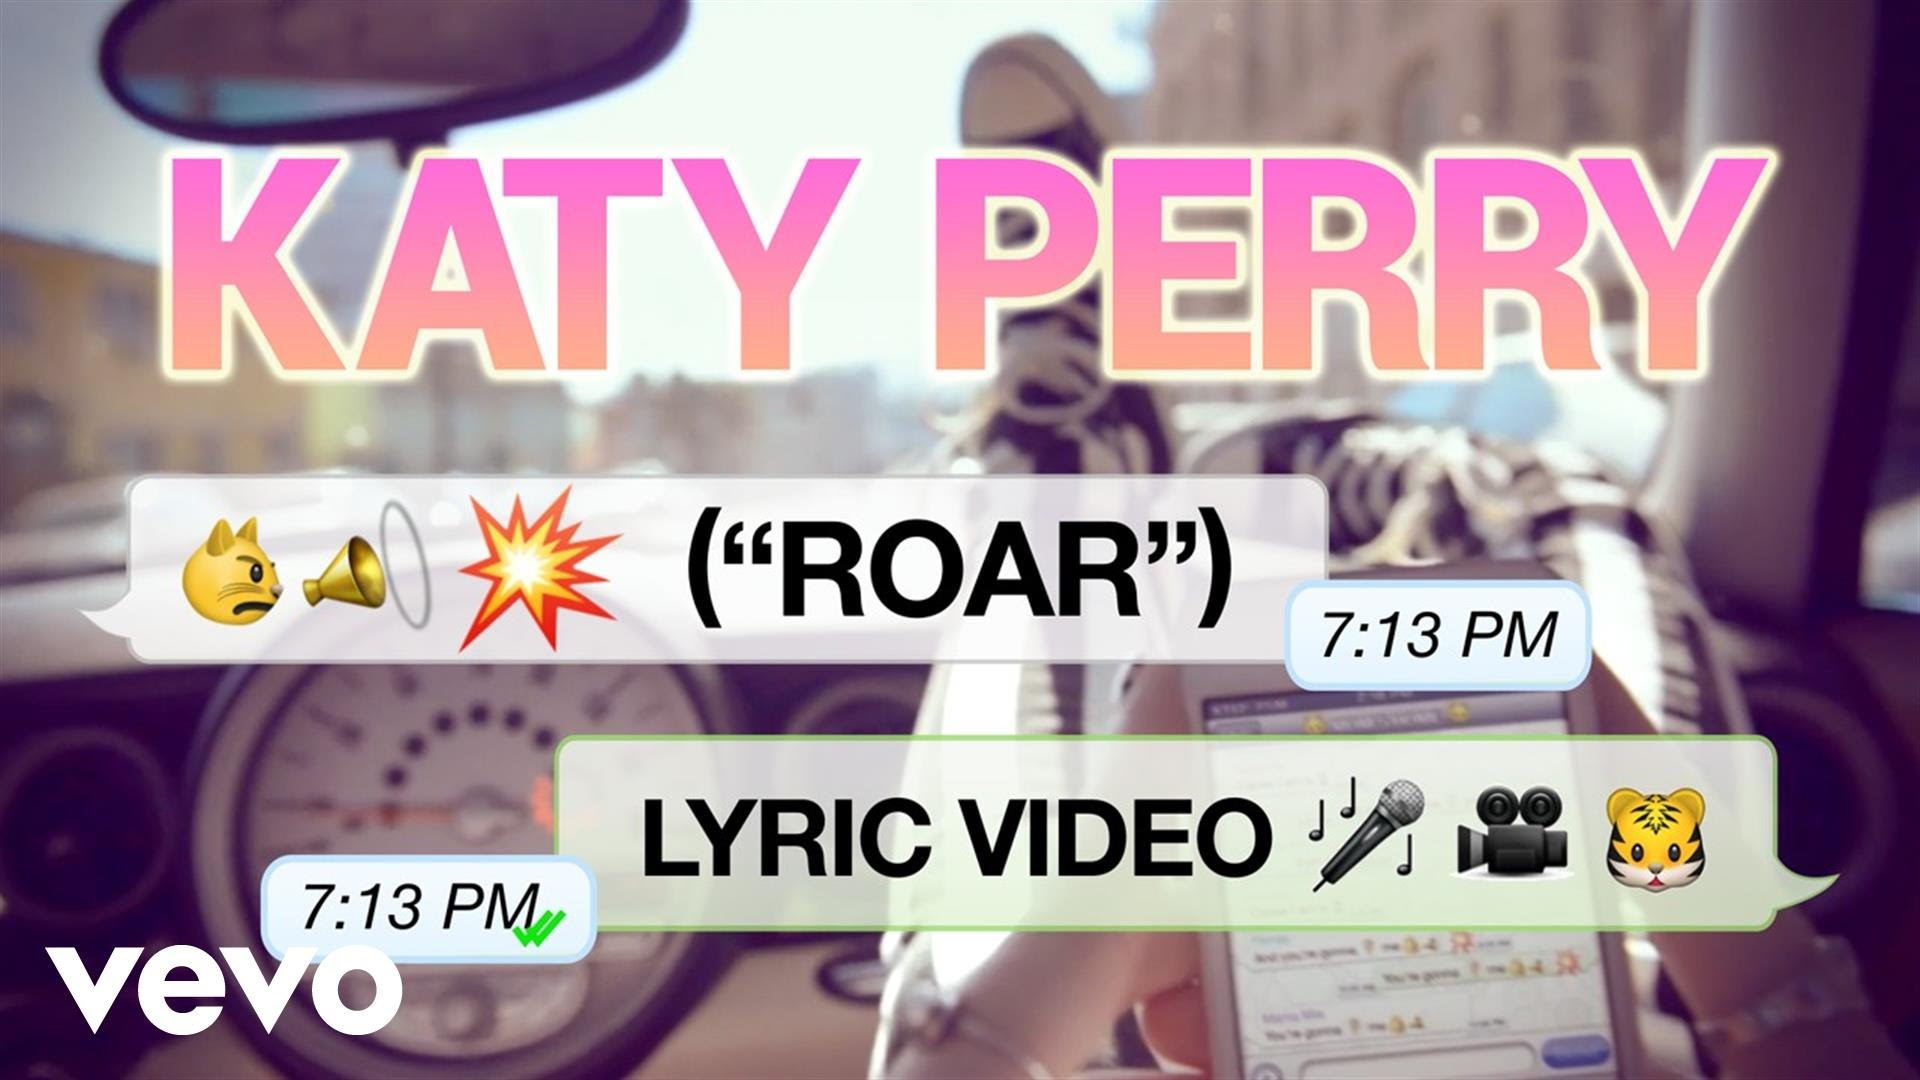 Katy Perry – Roar (Lyric Video)